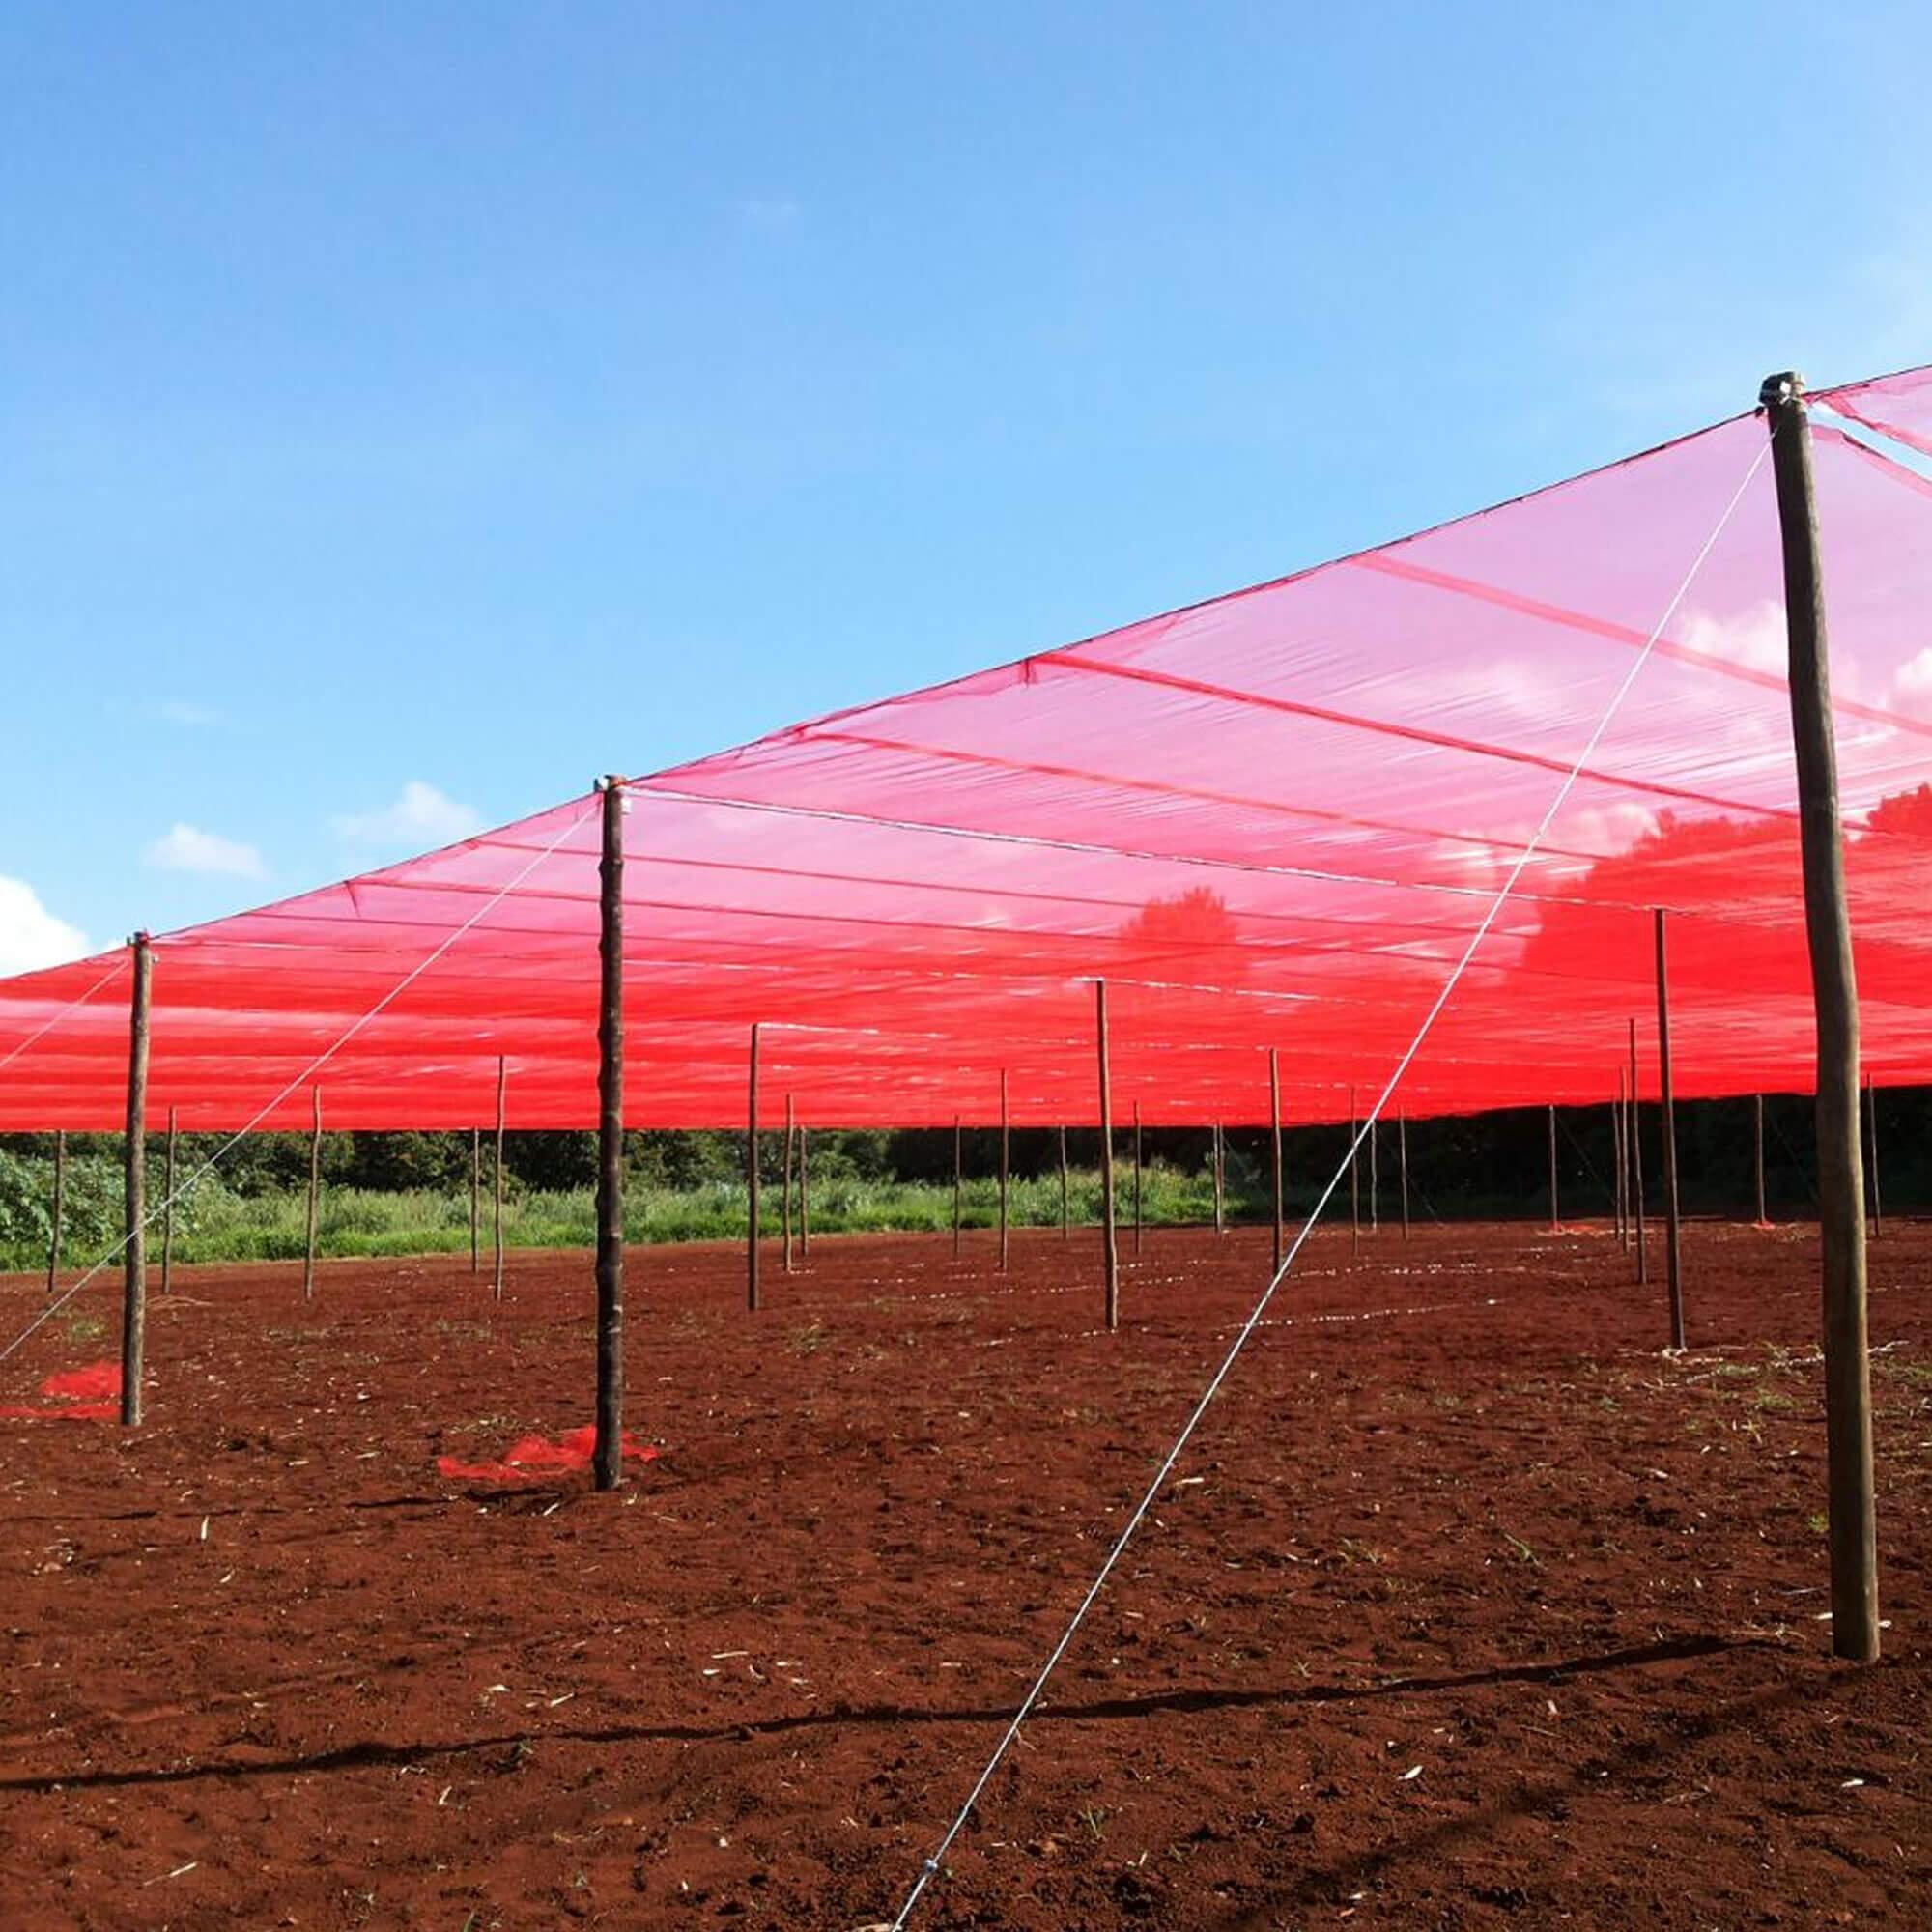 Tela de Sombreamento Vermelha 20% - 4,15 x 50 metros